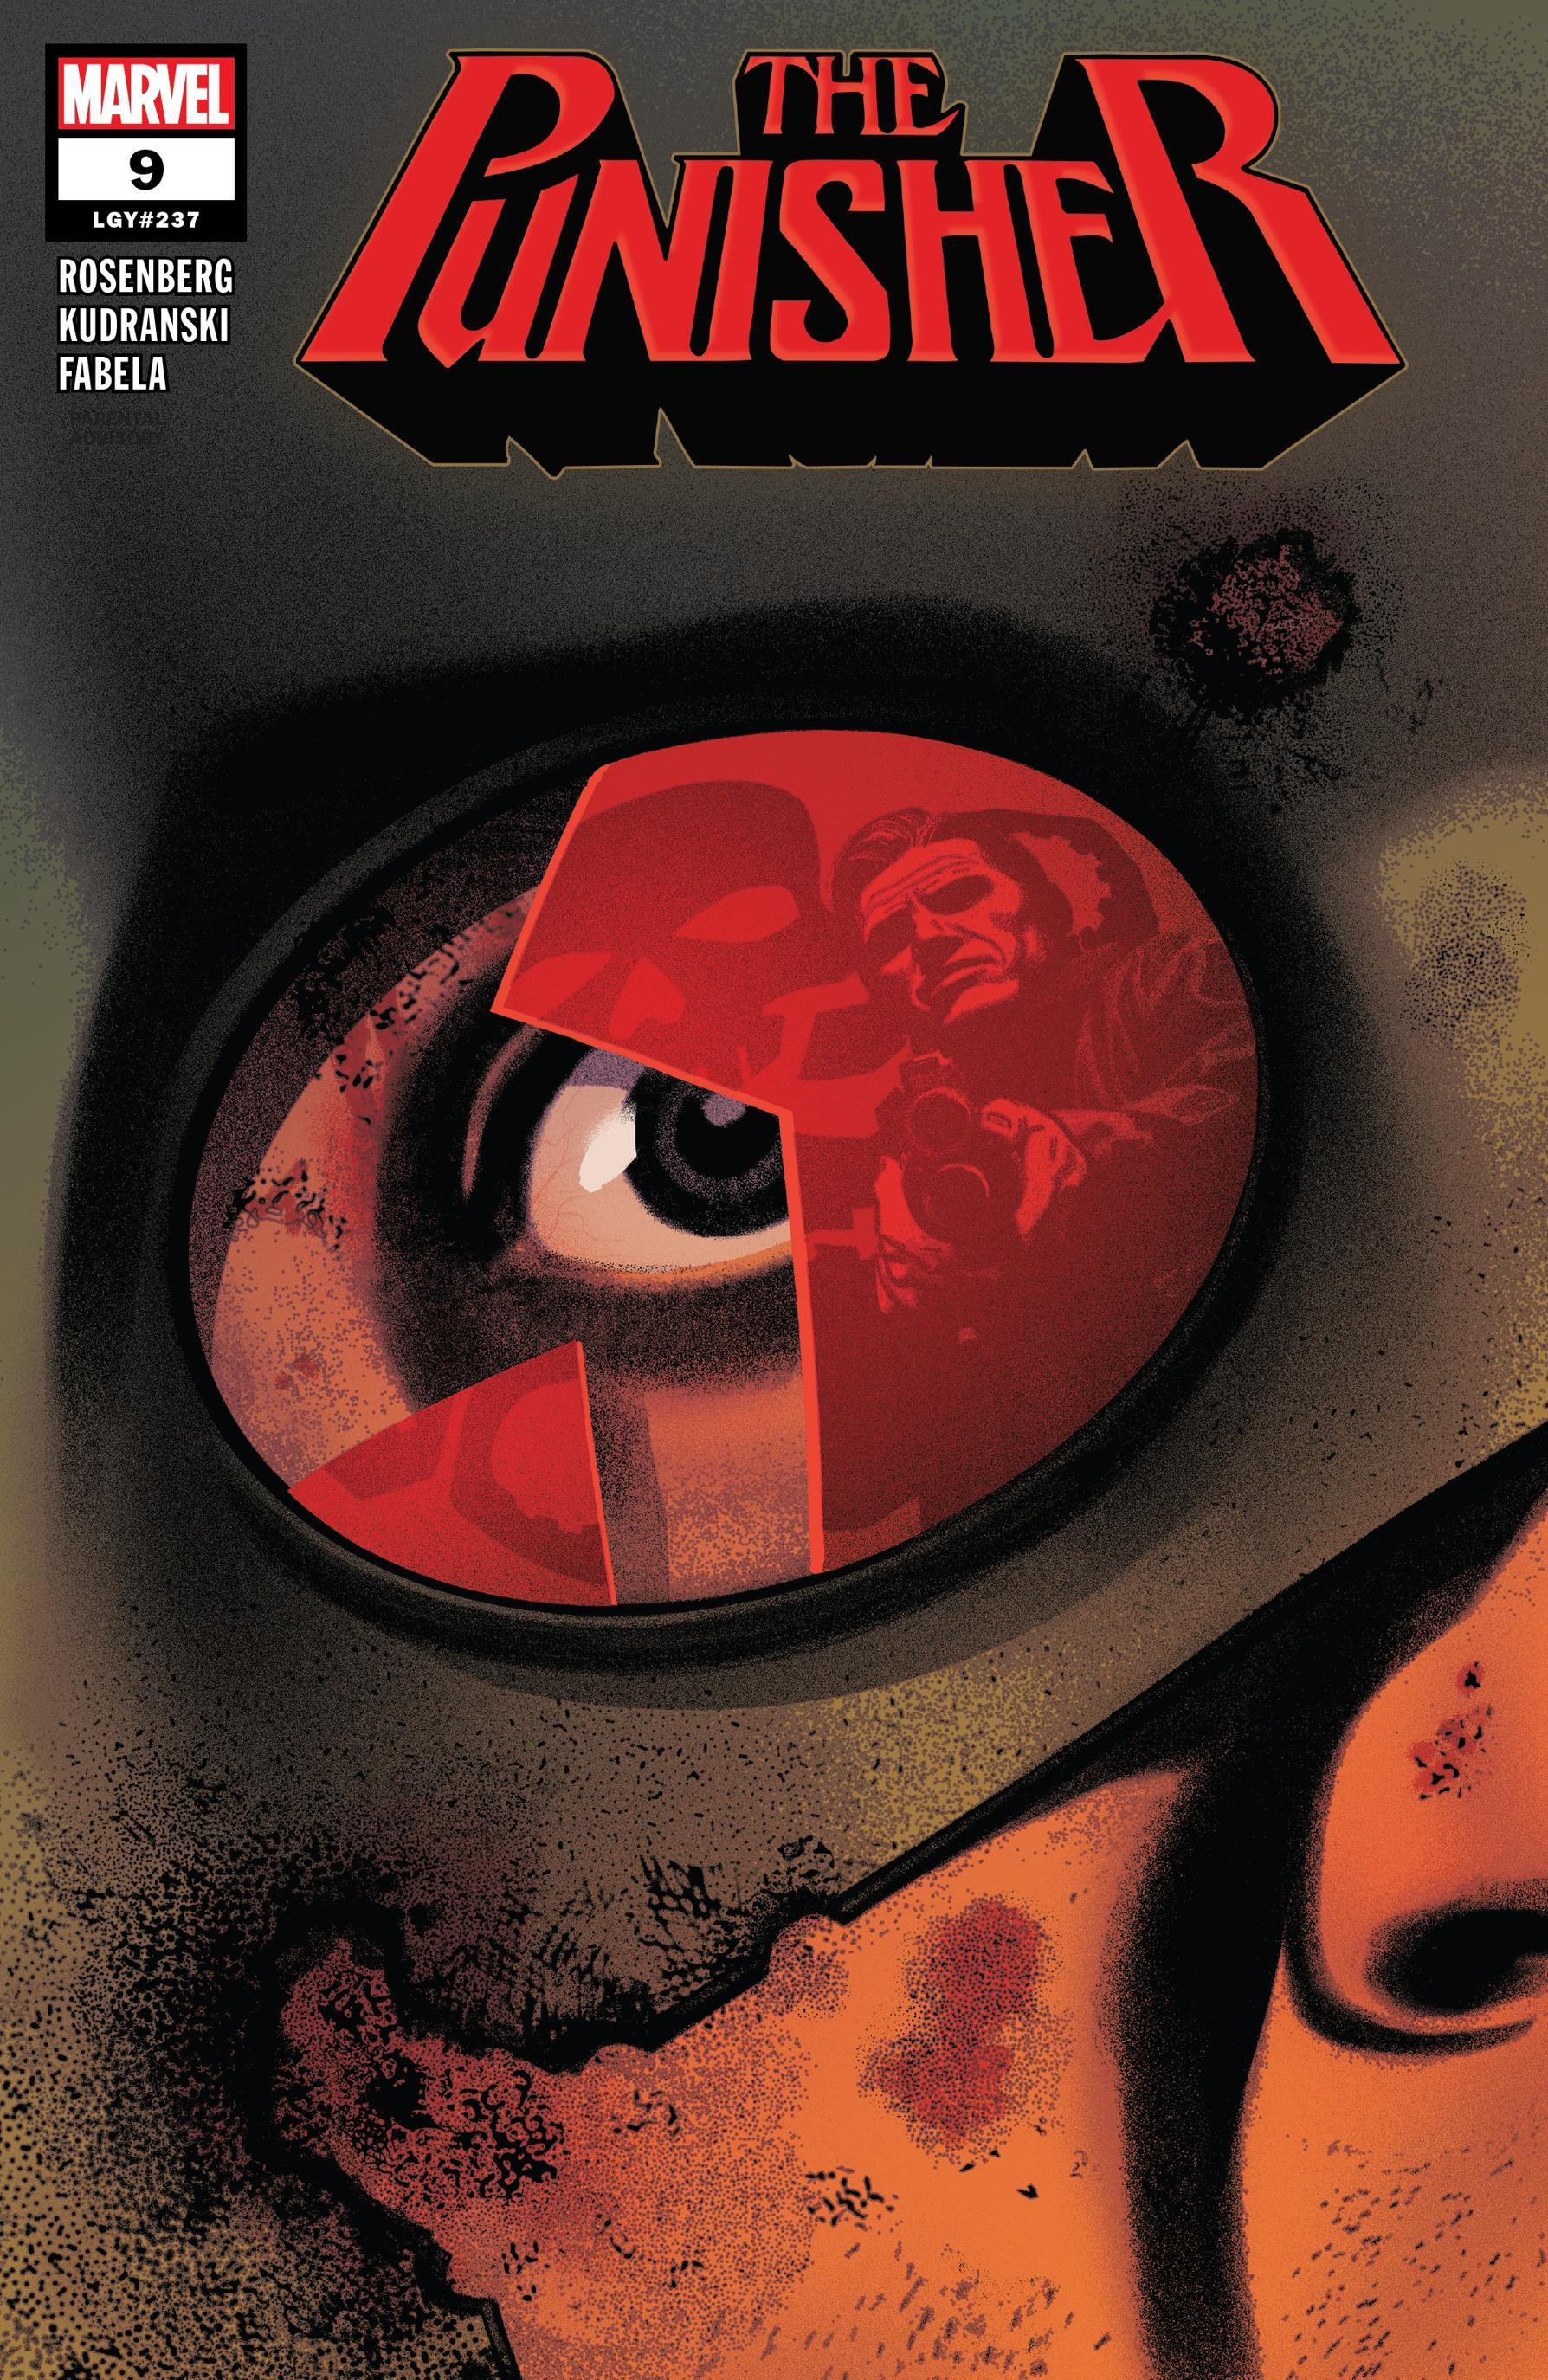 The Punisher 009 2019 Digital Zone